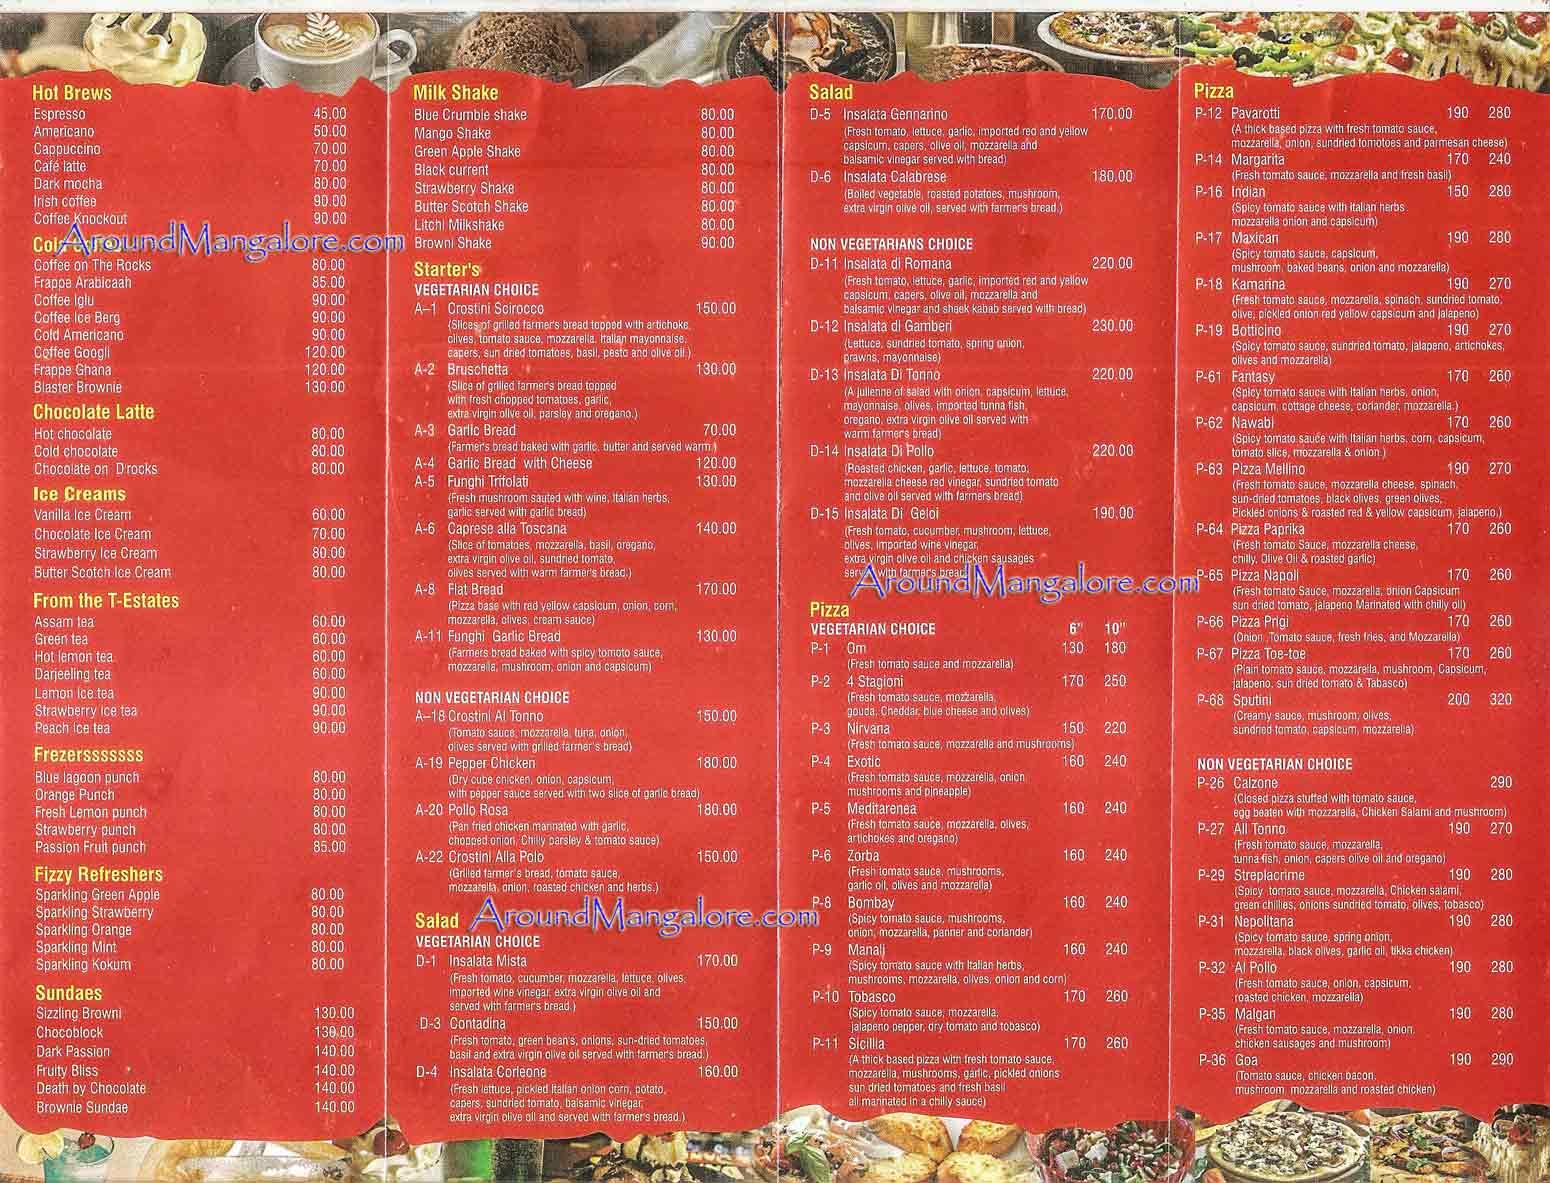 Food Menu Scirocco The Pizzeria Italian Restaurant Mangalore P1 - Scirocco - The Pizzeria - Italian Restaurant